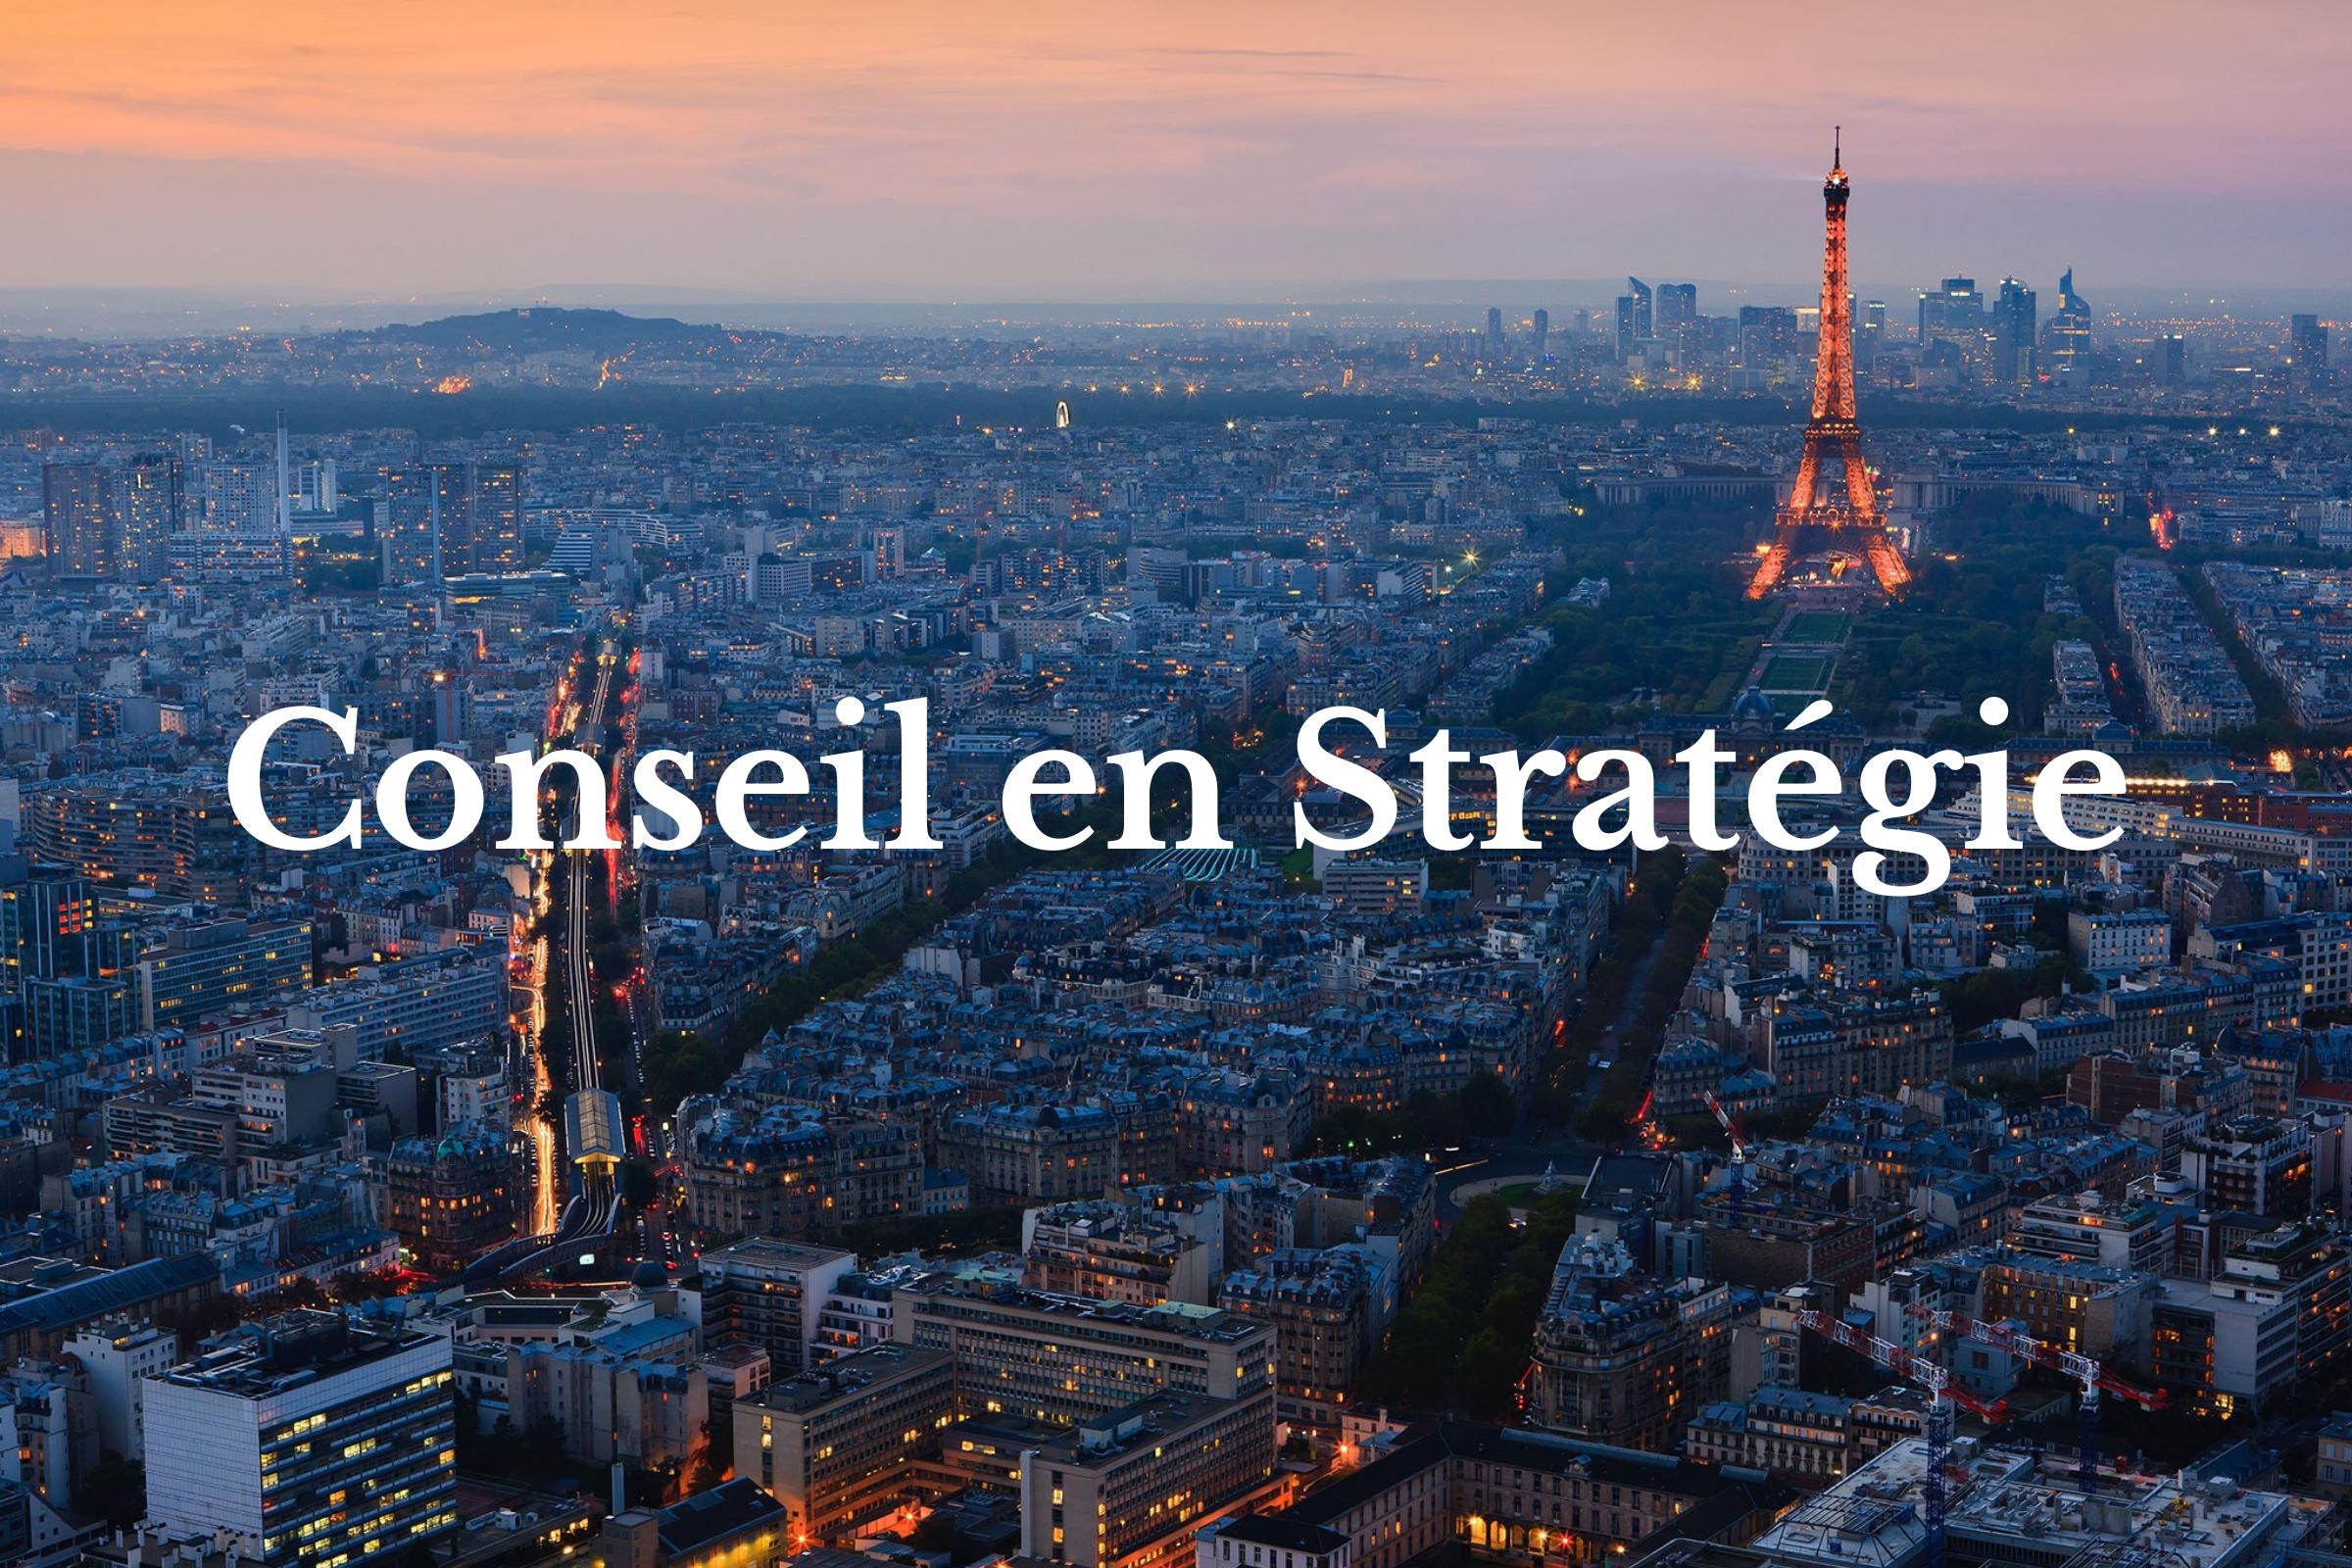 Conseil en strategie